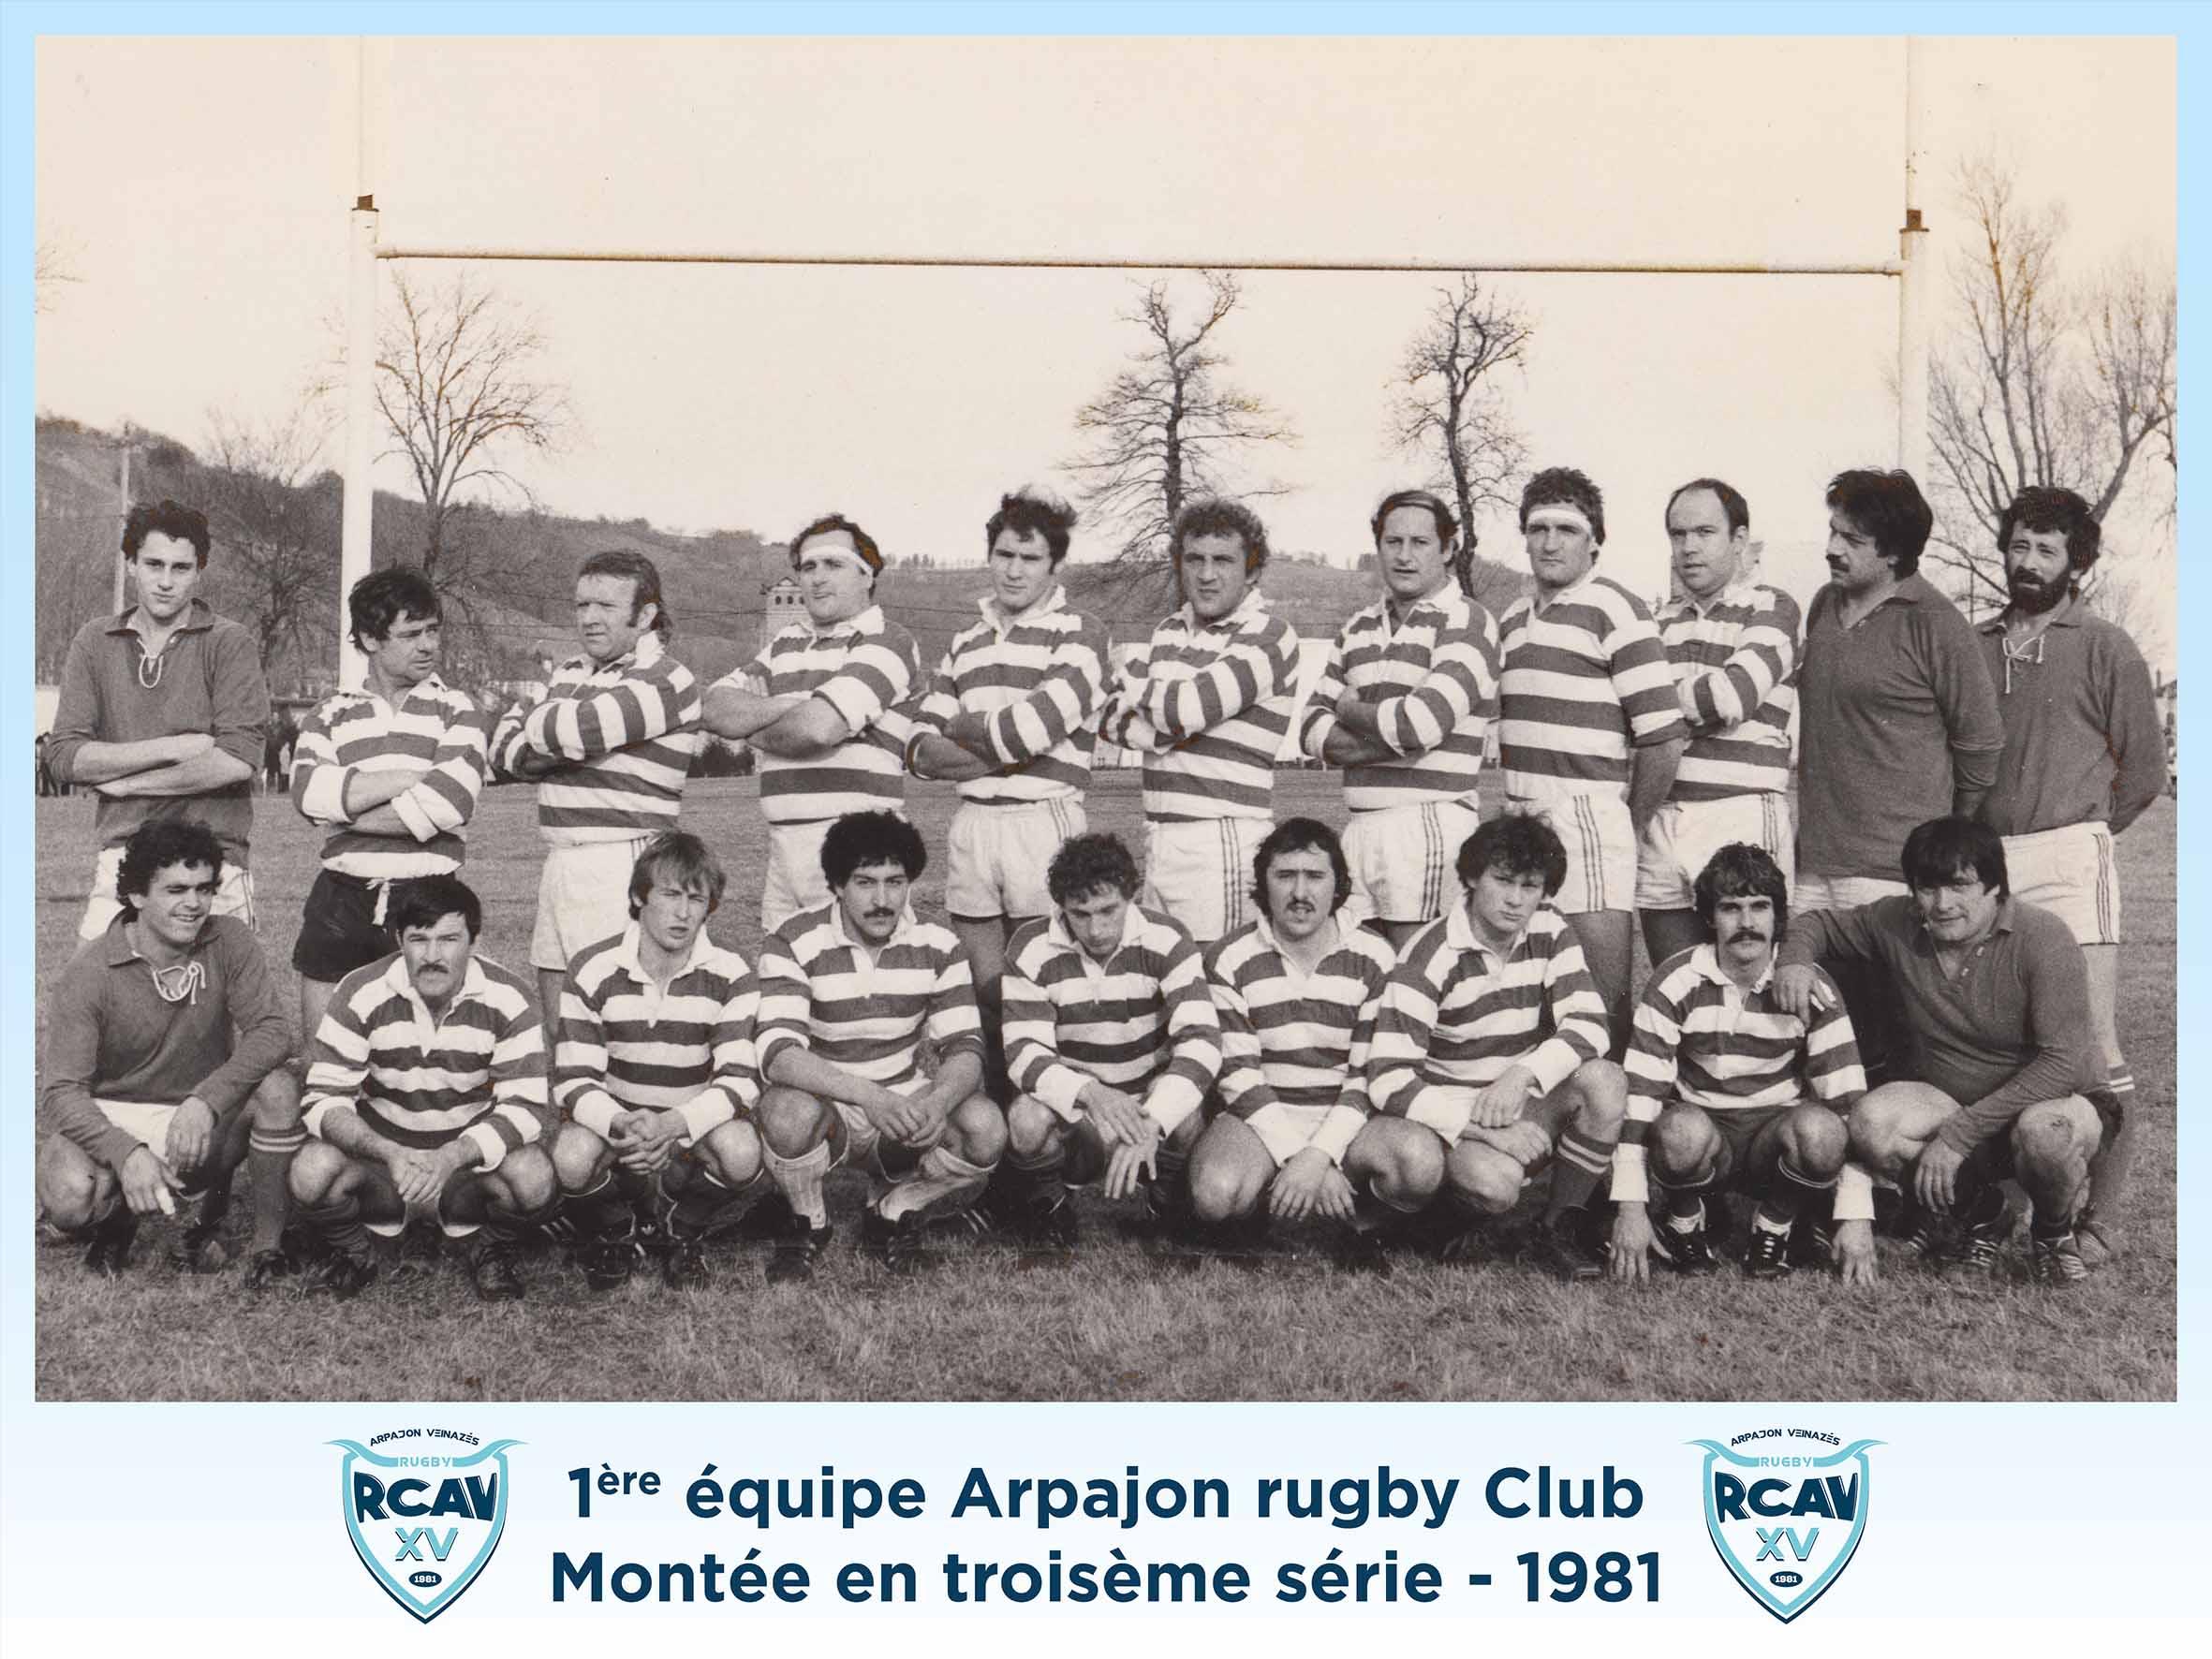 https://www.rcav15.com/wp-content/uploads/2021/09/1981-1ere-equipe-Arpajon-montee-3e-serie.jpg